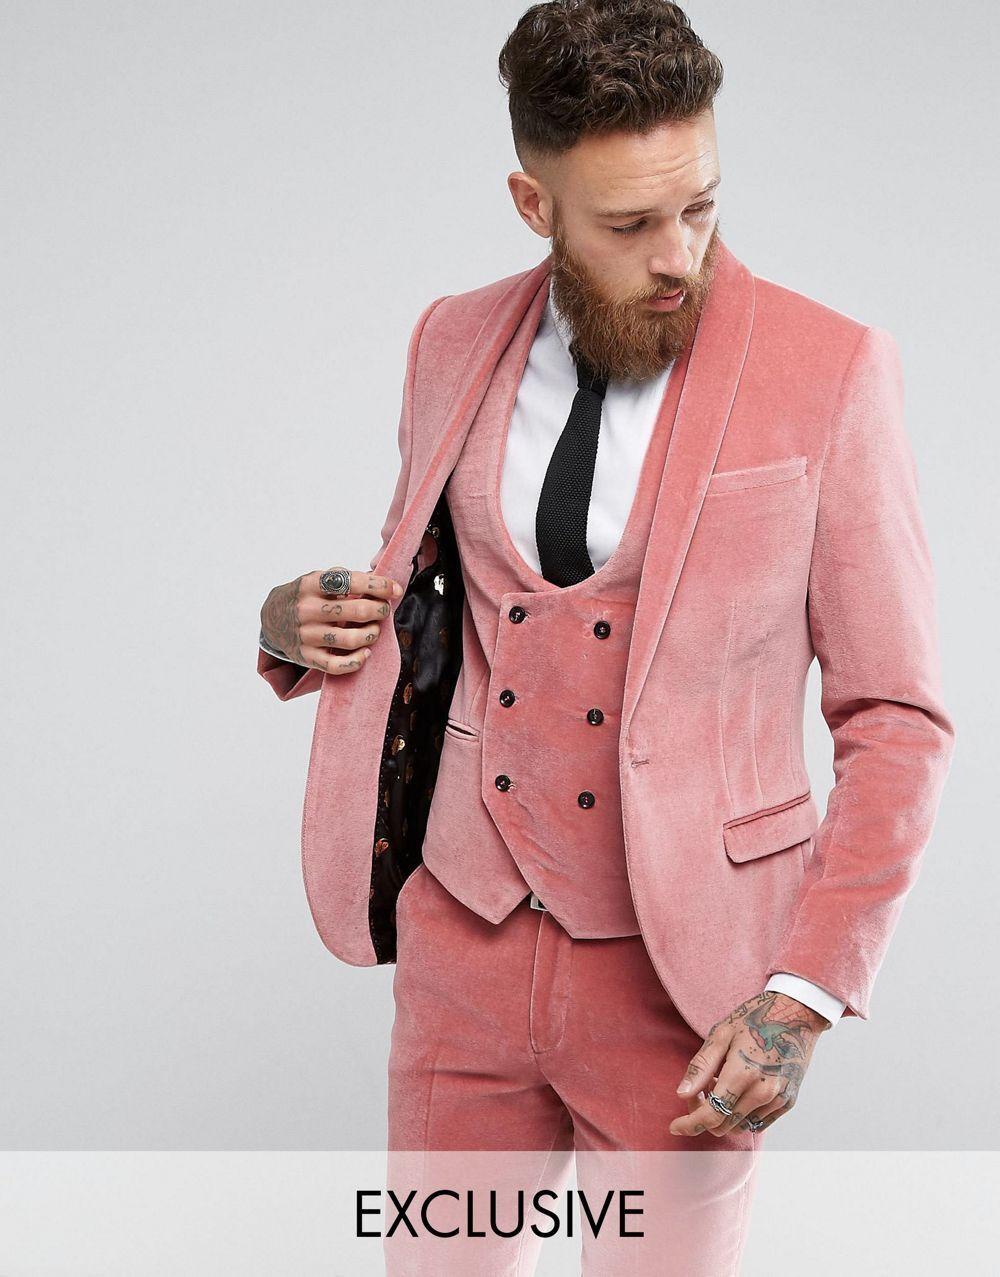 MENS WEDDING DRESS DESIGNER LIGHT BEIGE JACKET TROUSER SUIT SUITS 38 40 42 44 46